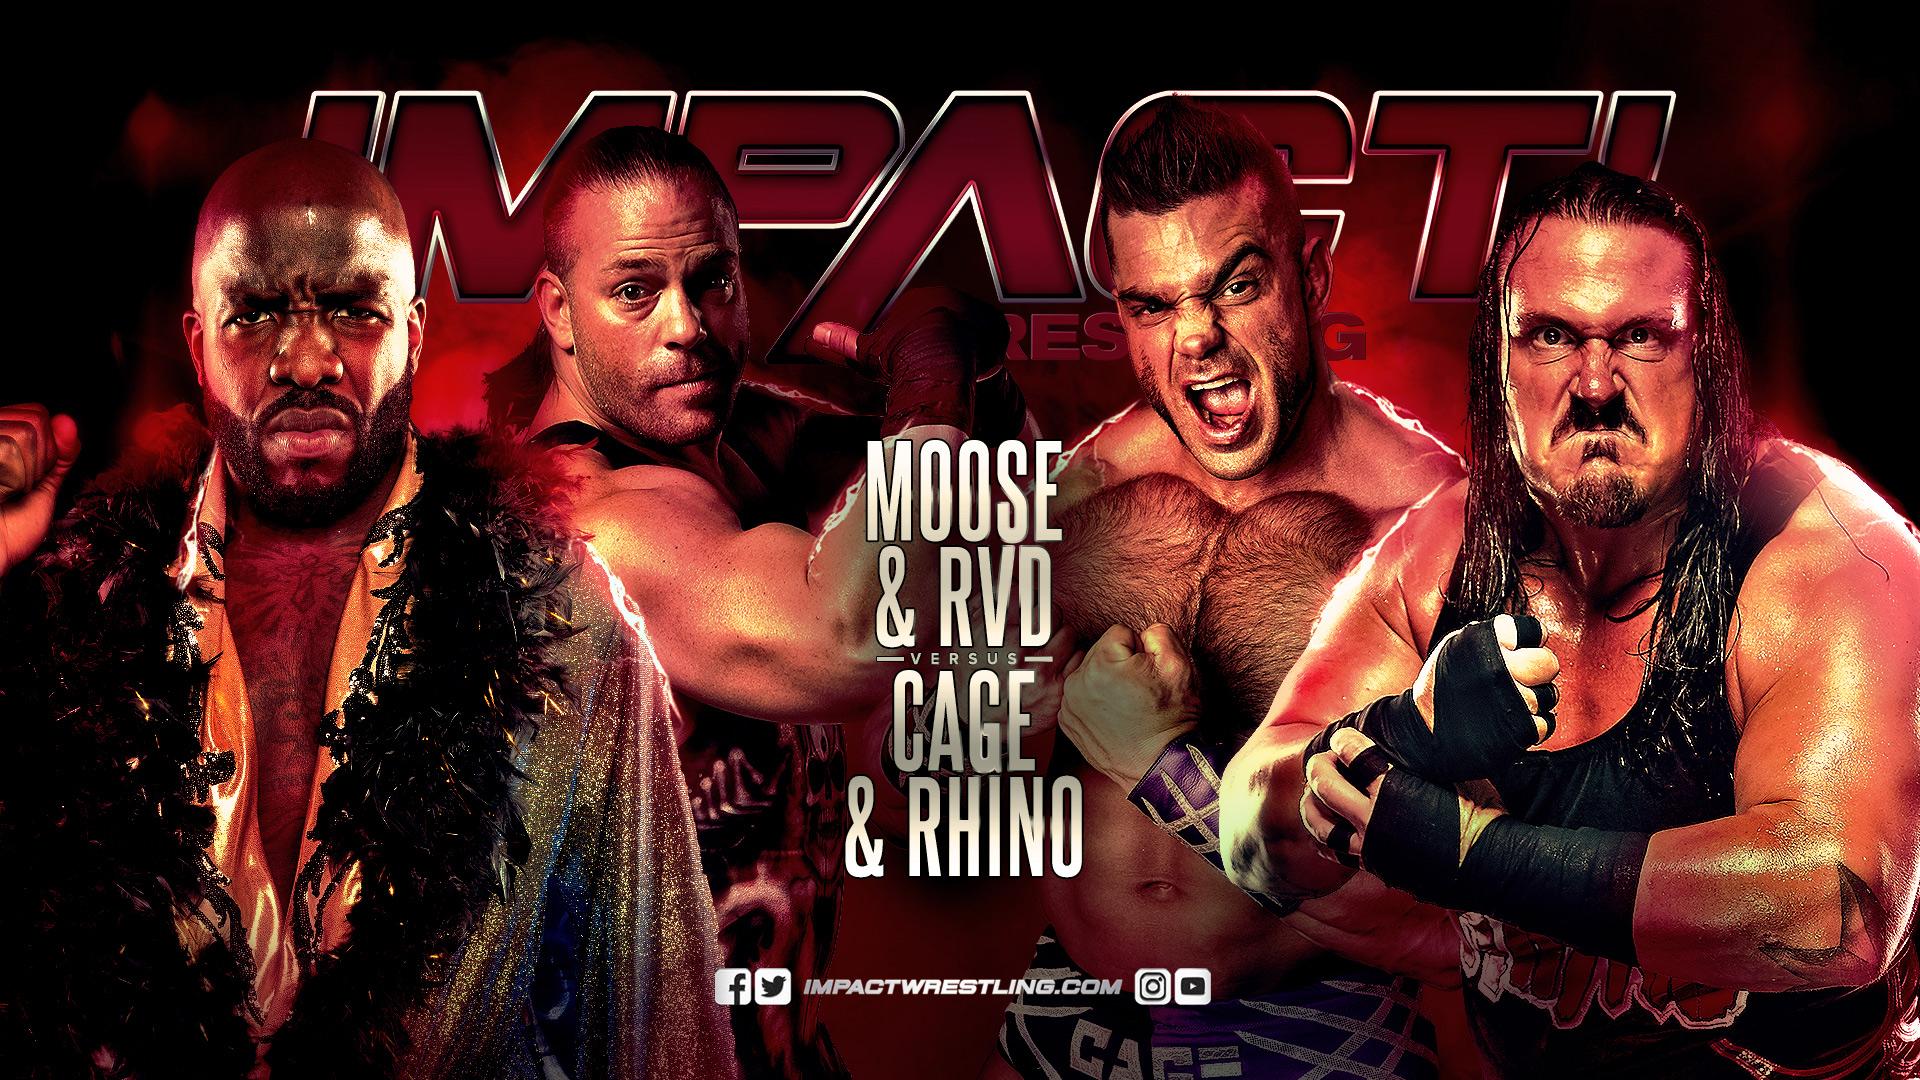 Cage Rhino RVD Moose